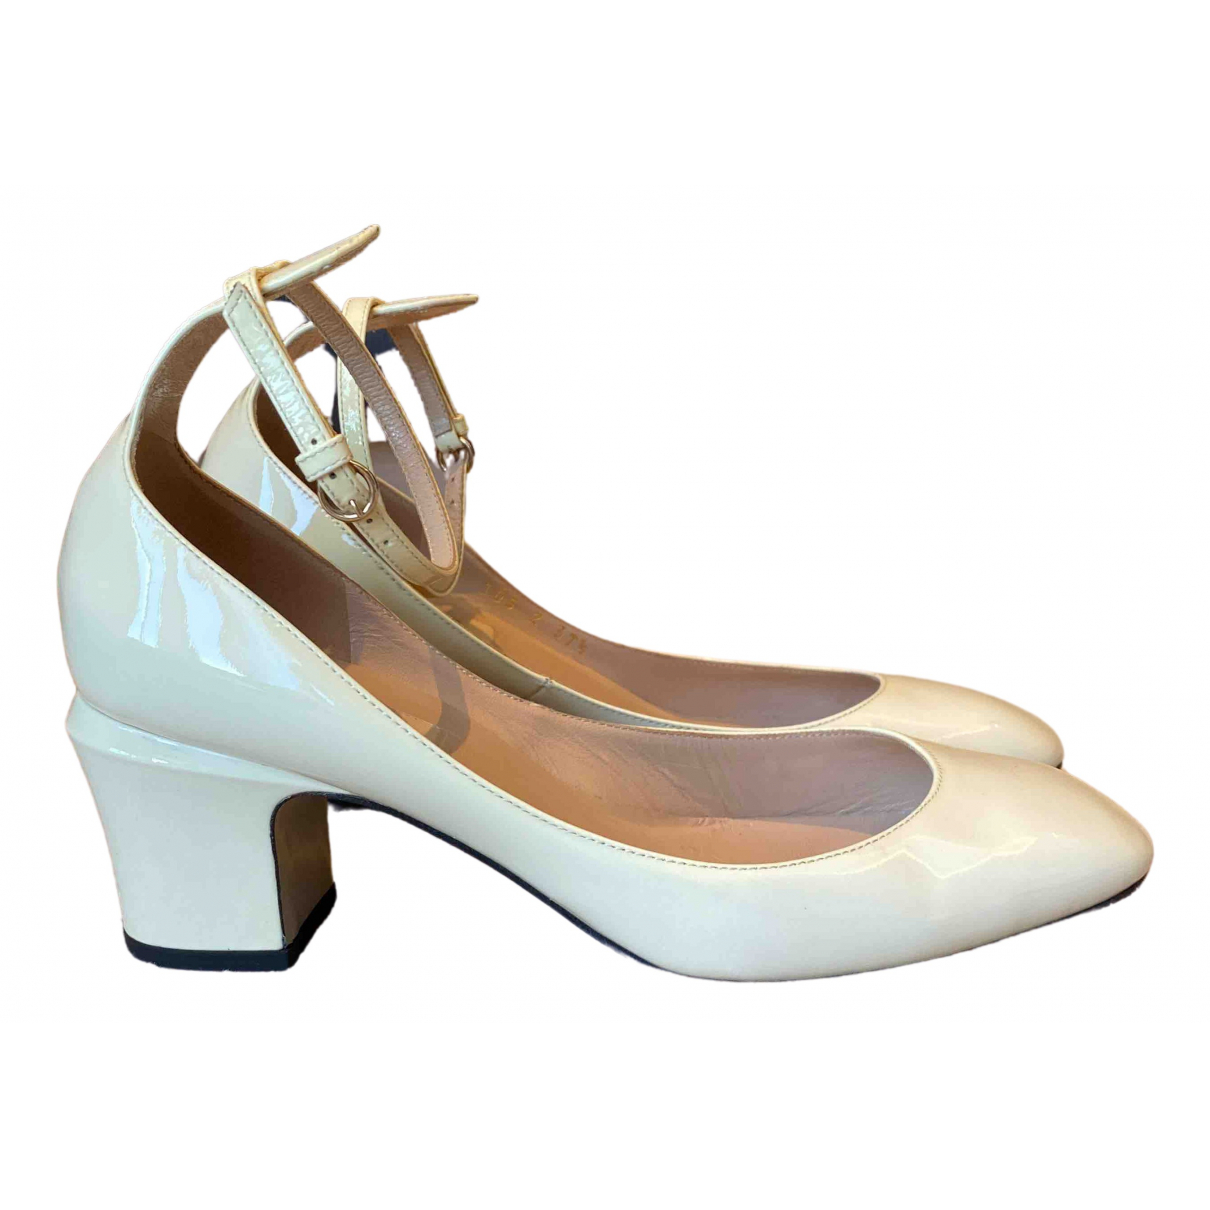 Valentino Garavani Tango Beige Patent leather Sandals for Women 37.5 IT